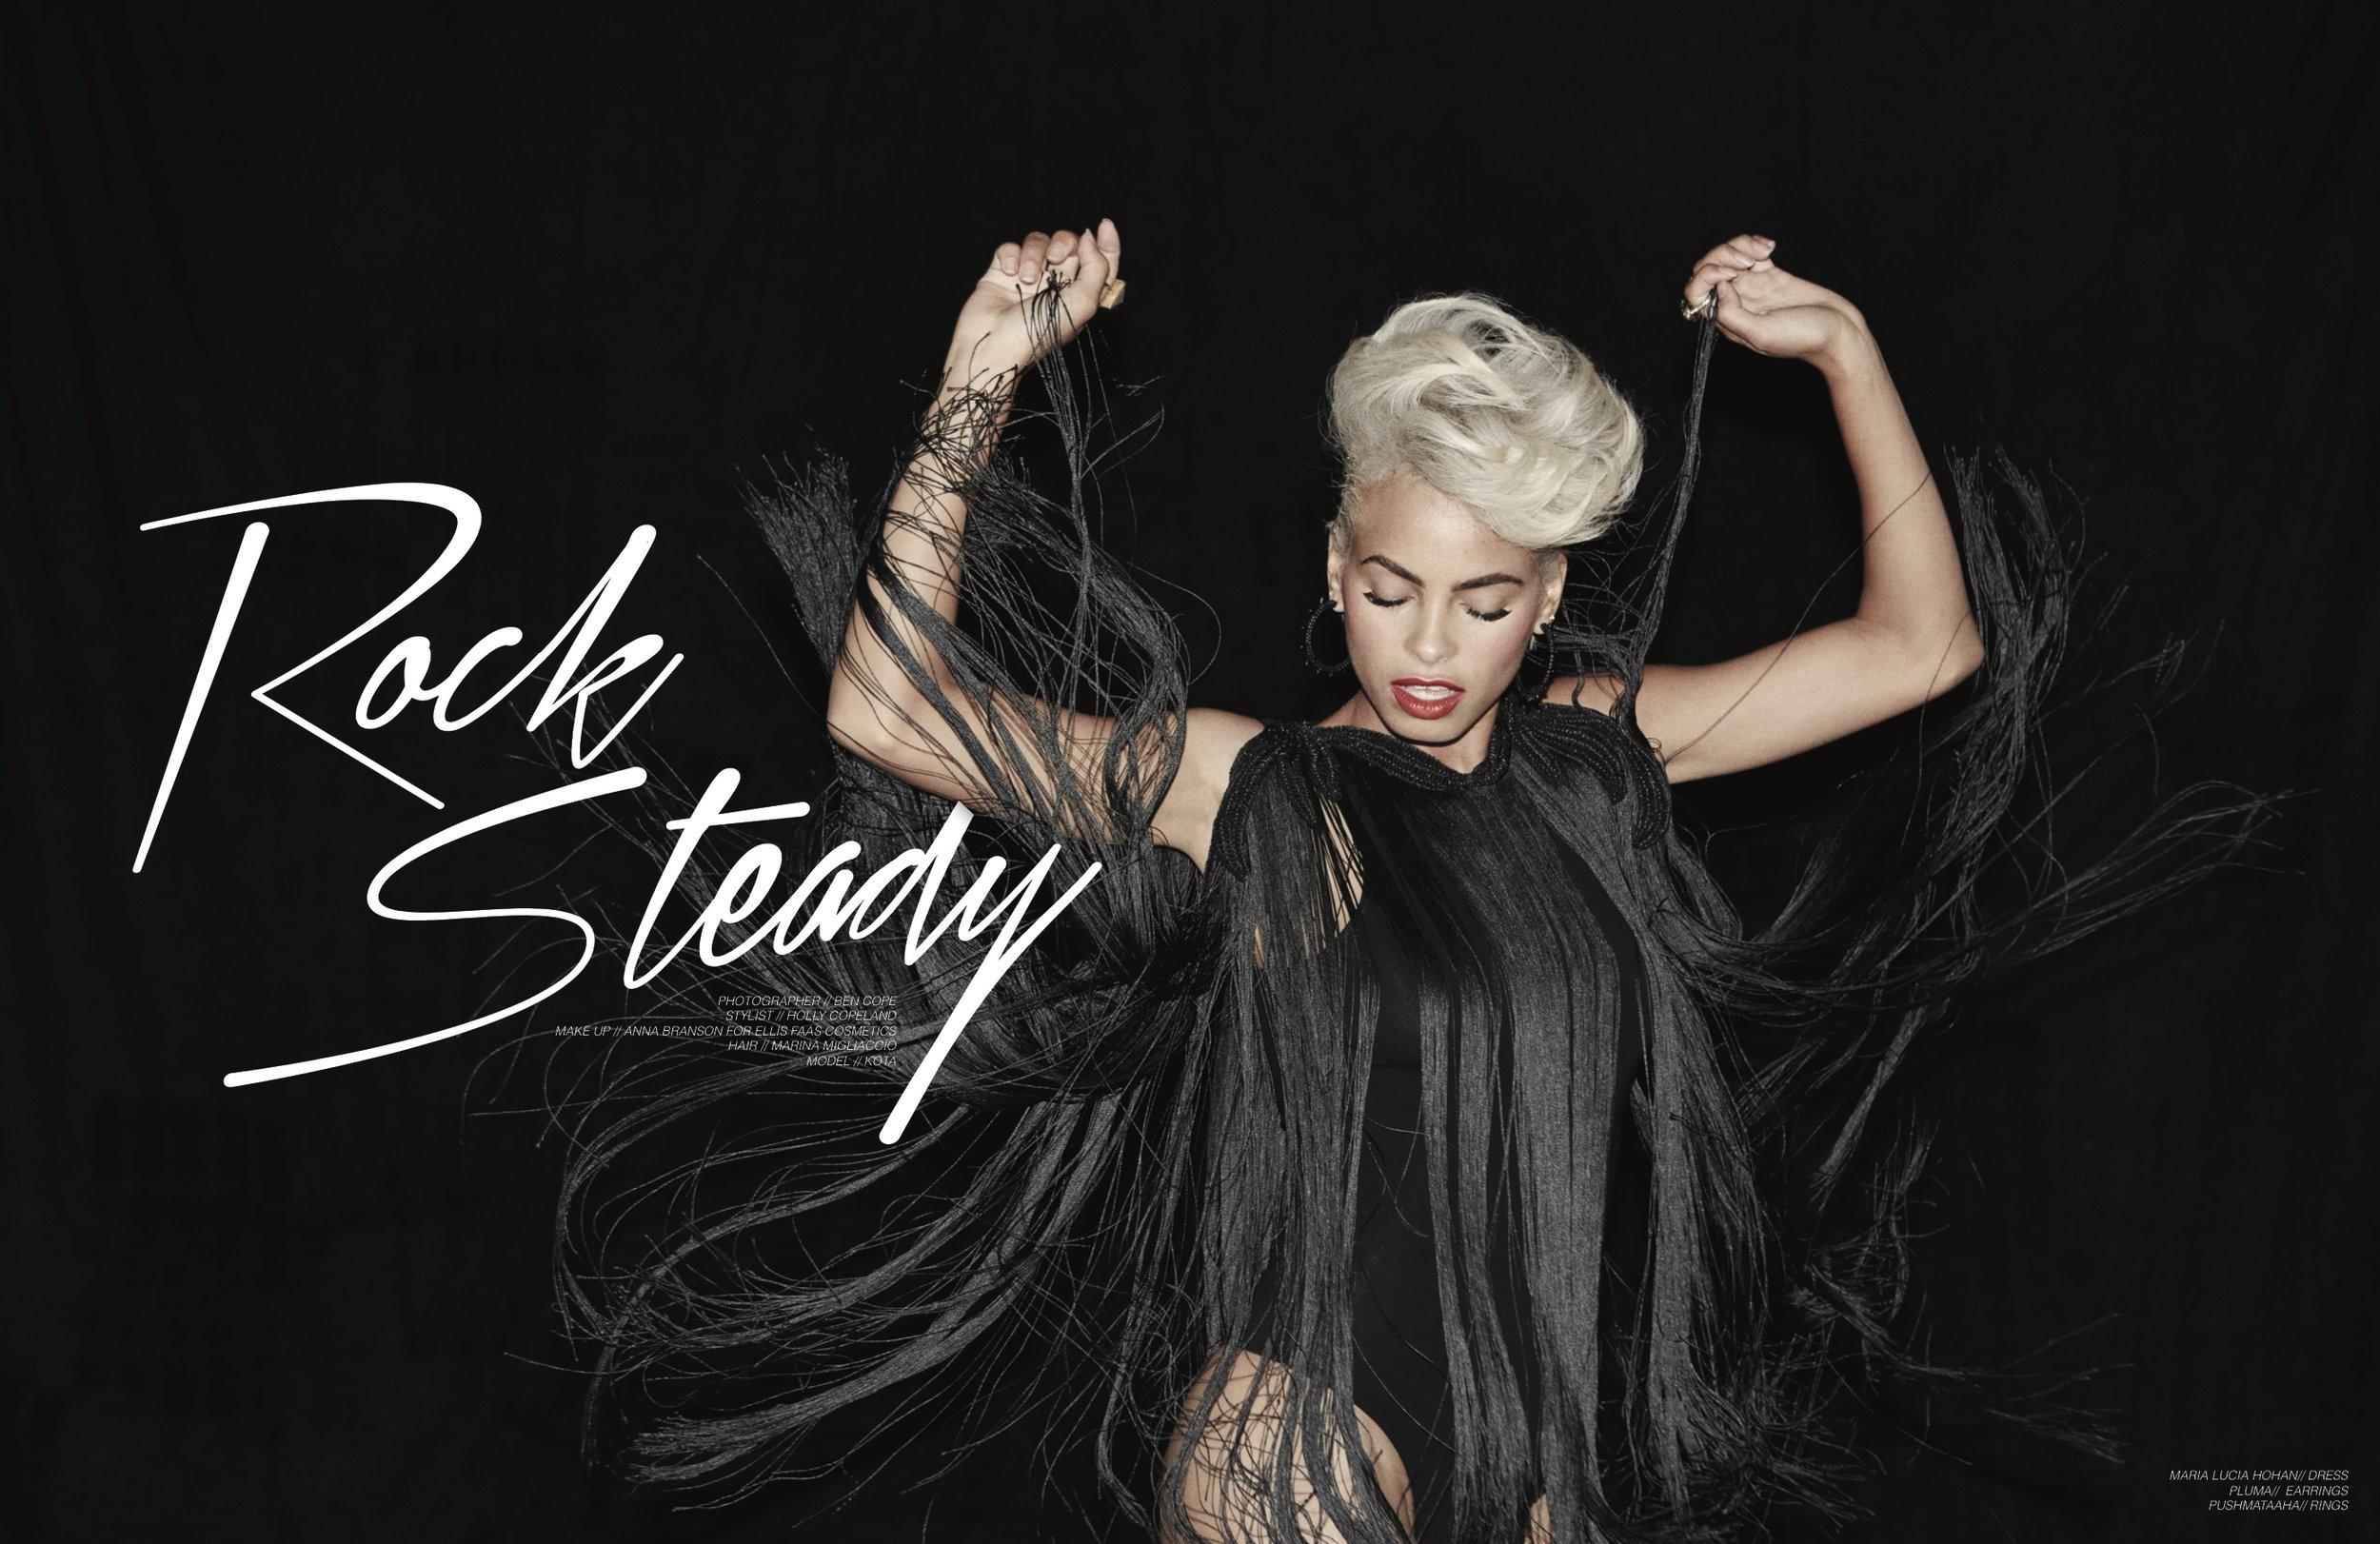 RockSteady 1.jpg